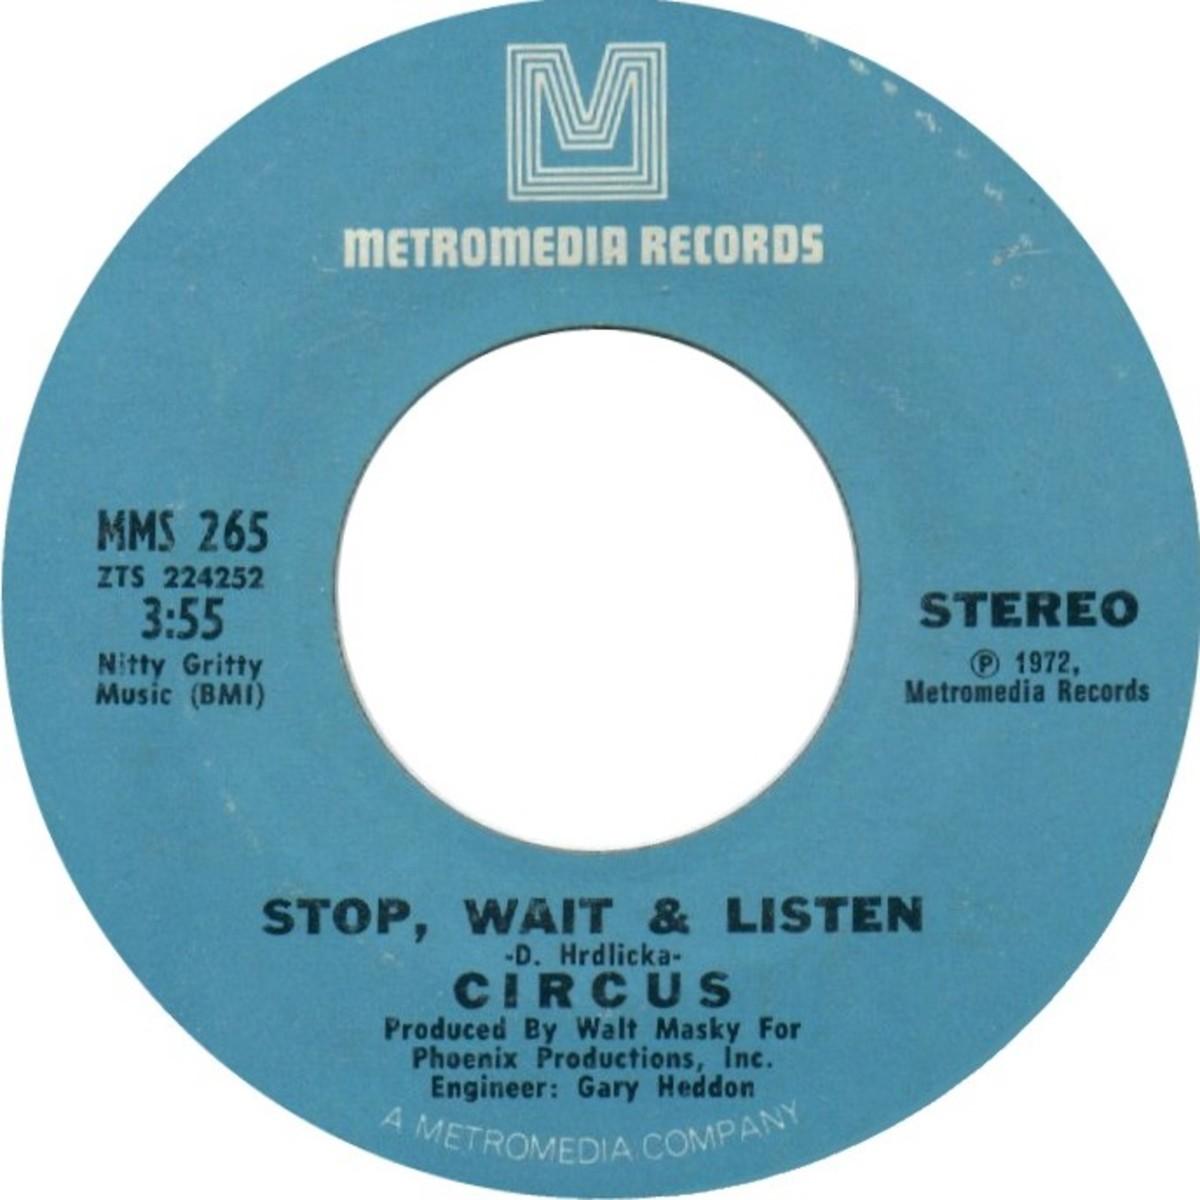 Billboard Top 100 debut February 24, 1973, peak position No. 91